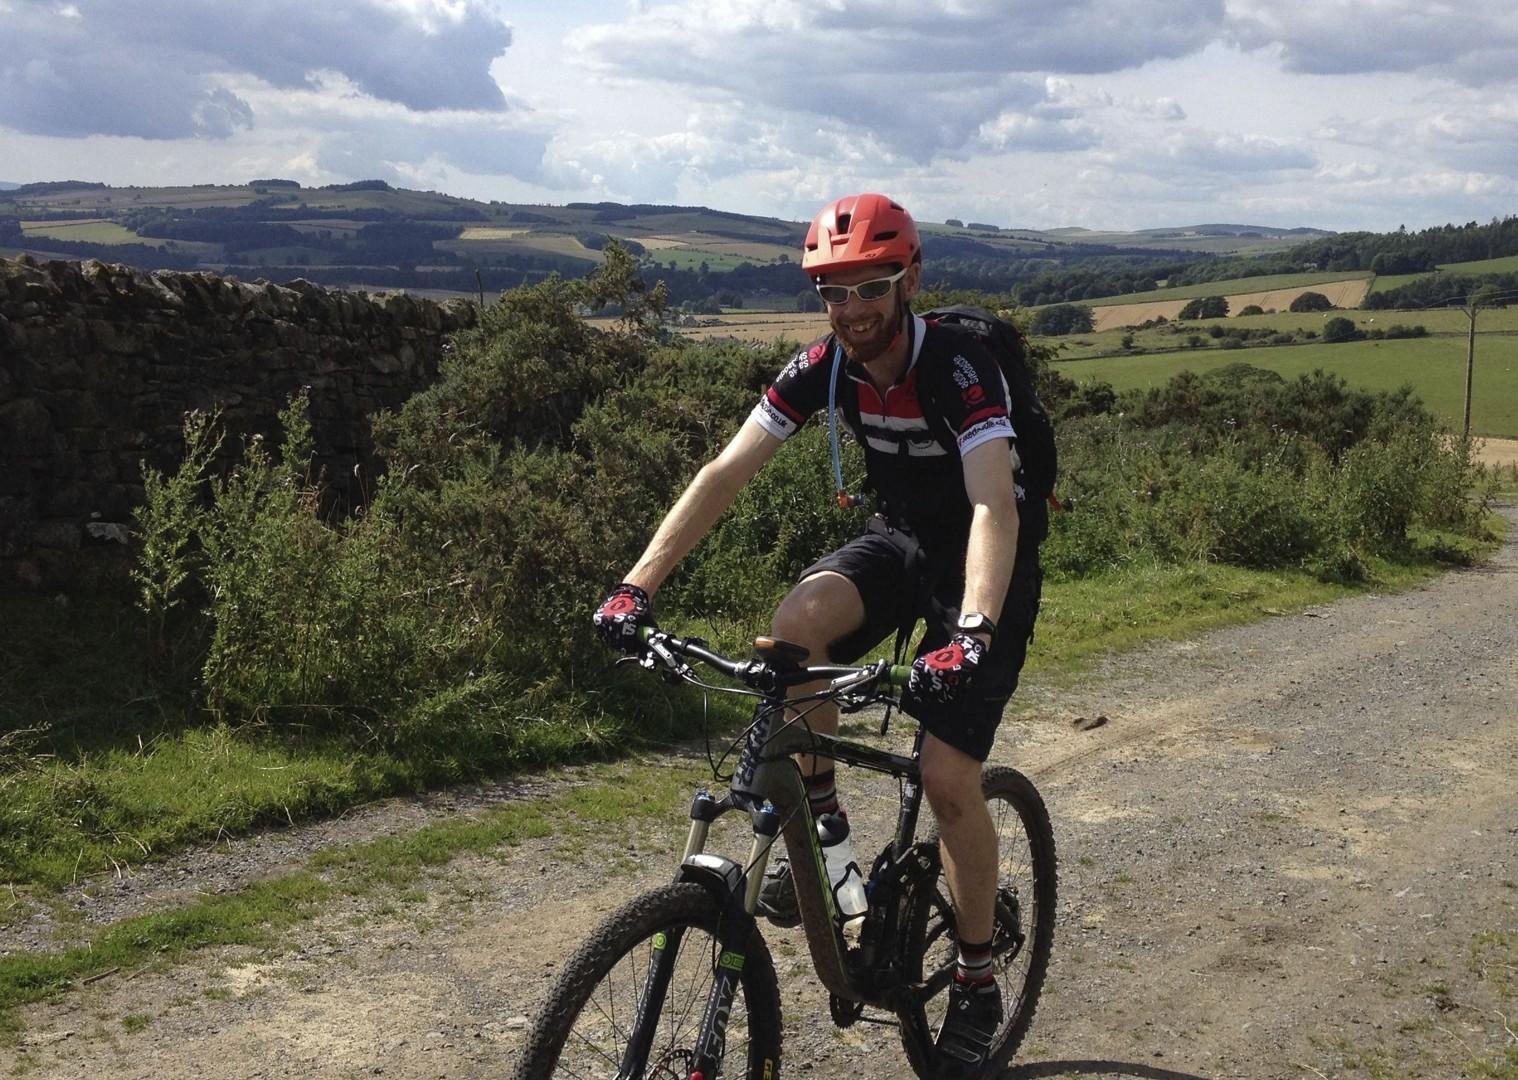 Sandstoneway4.jpg - UK - Northumberland - Sandstone Way - Mountain Biking